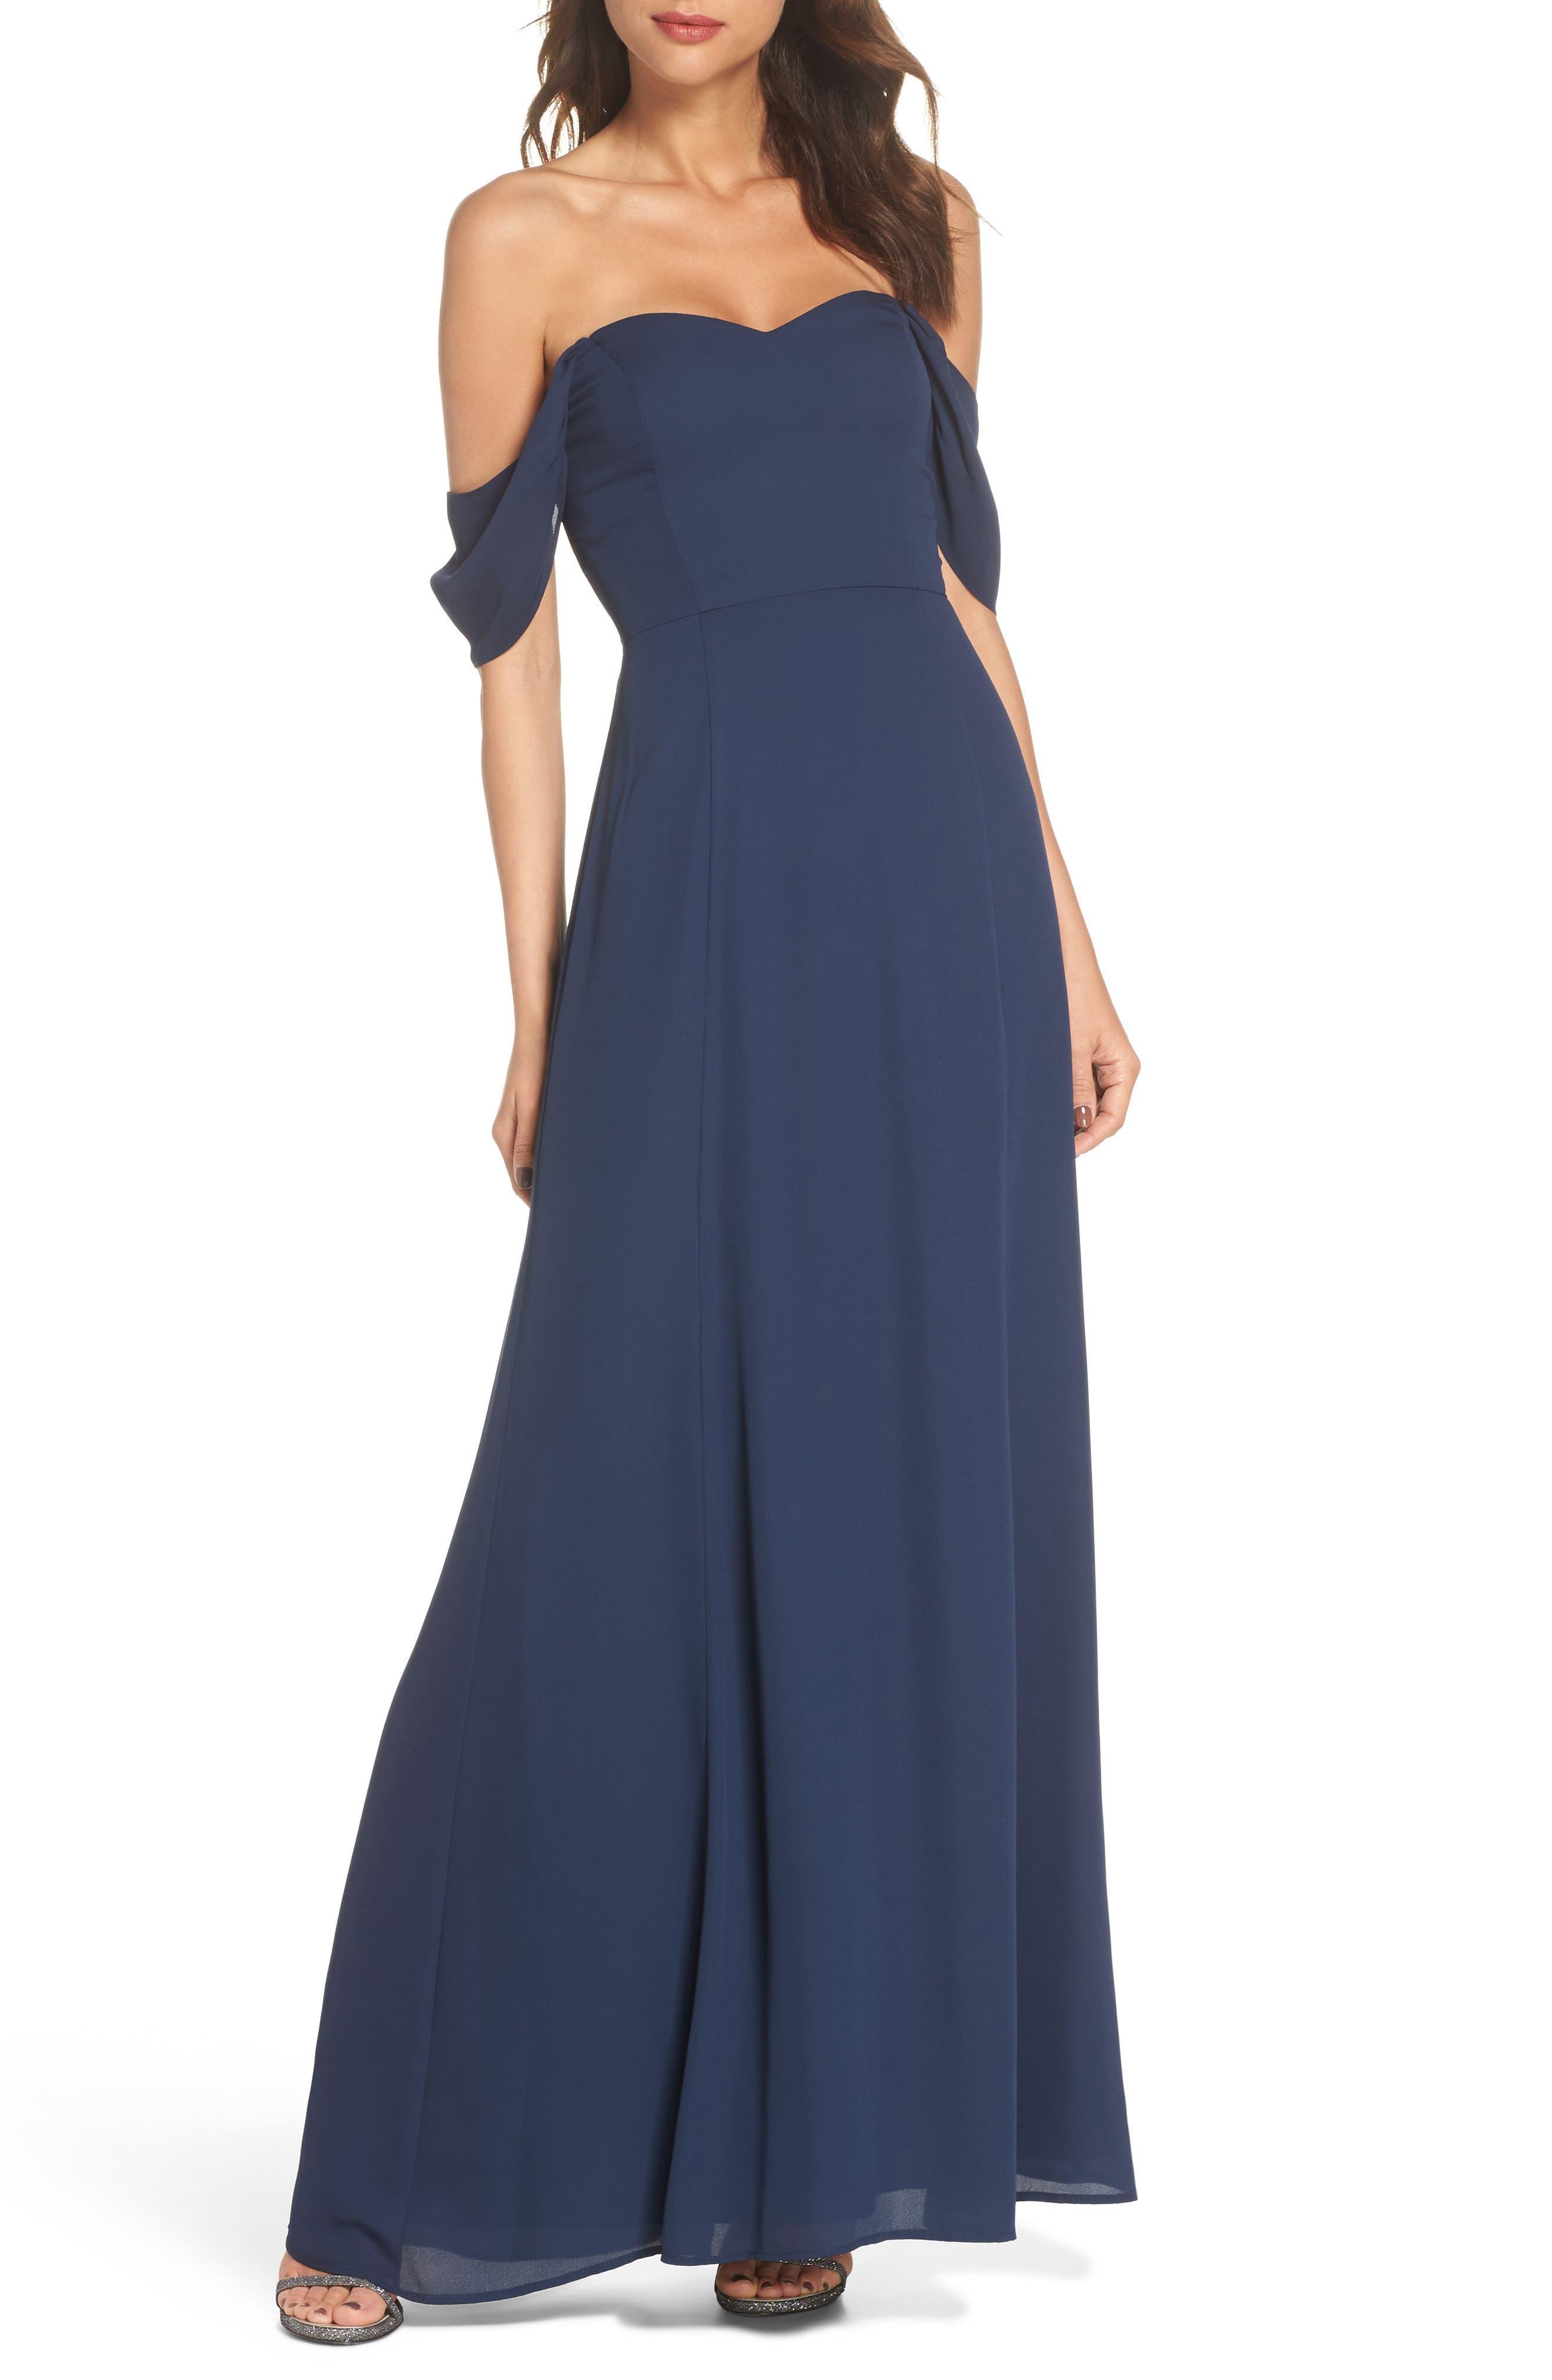 Rachel Off the Shoulder Gored Maxi Dress,                             Main thumbnail 1, color,